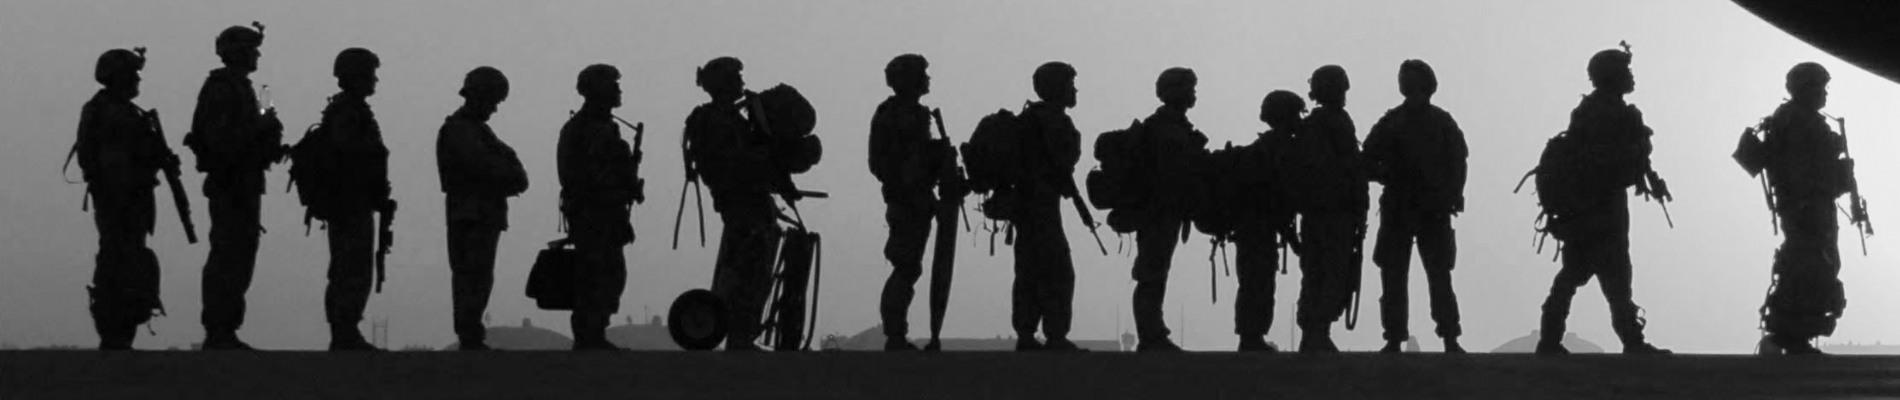 Header Military